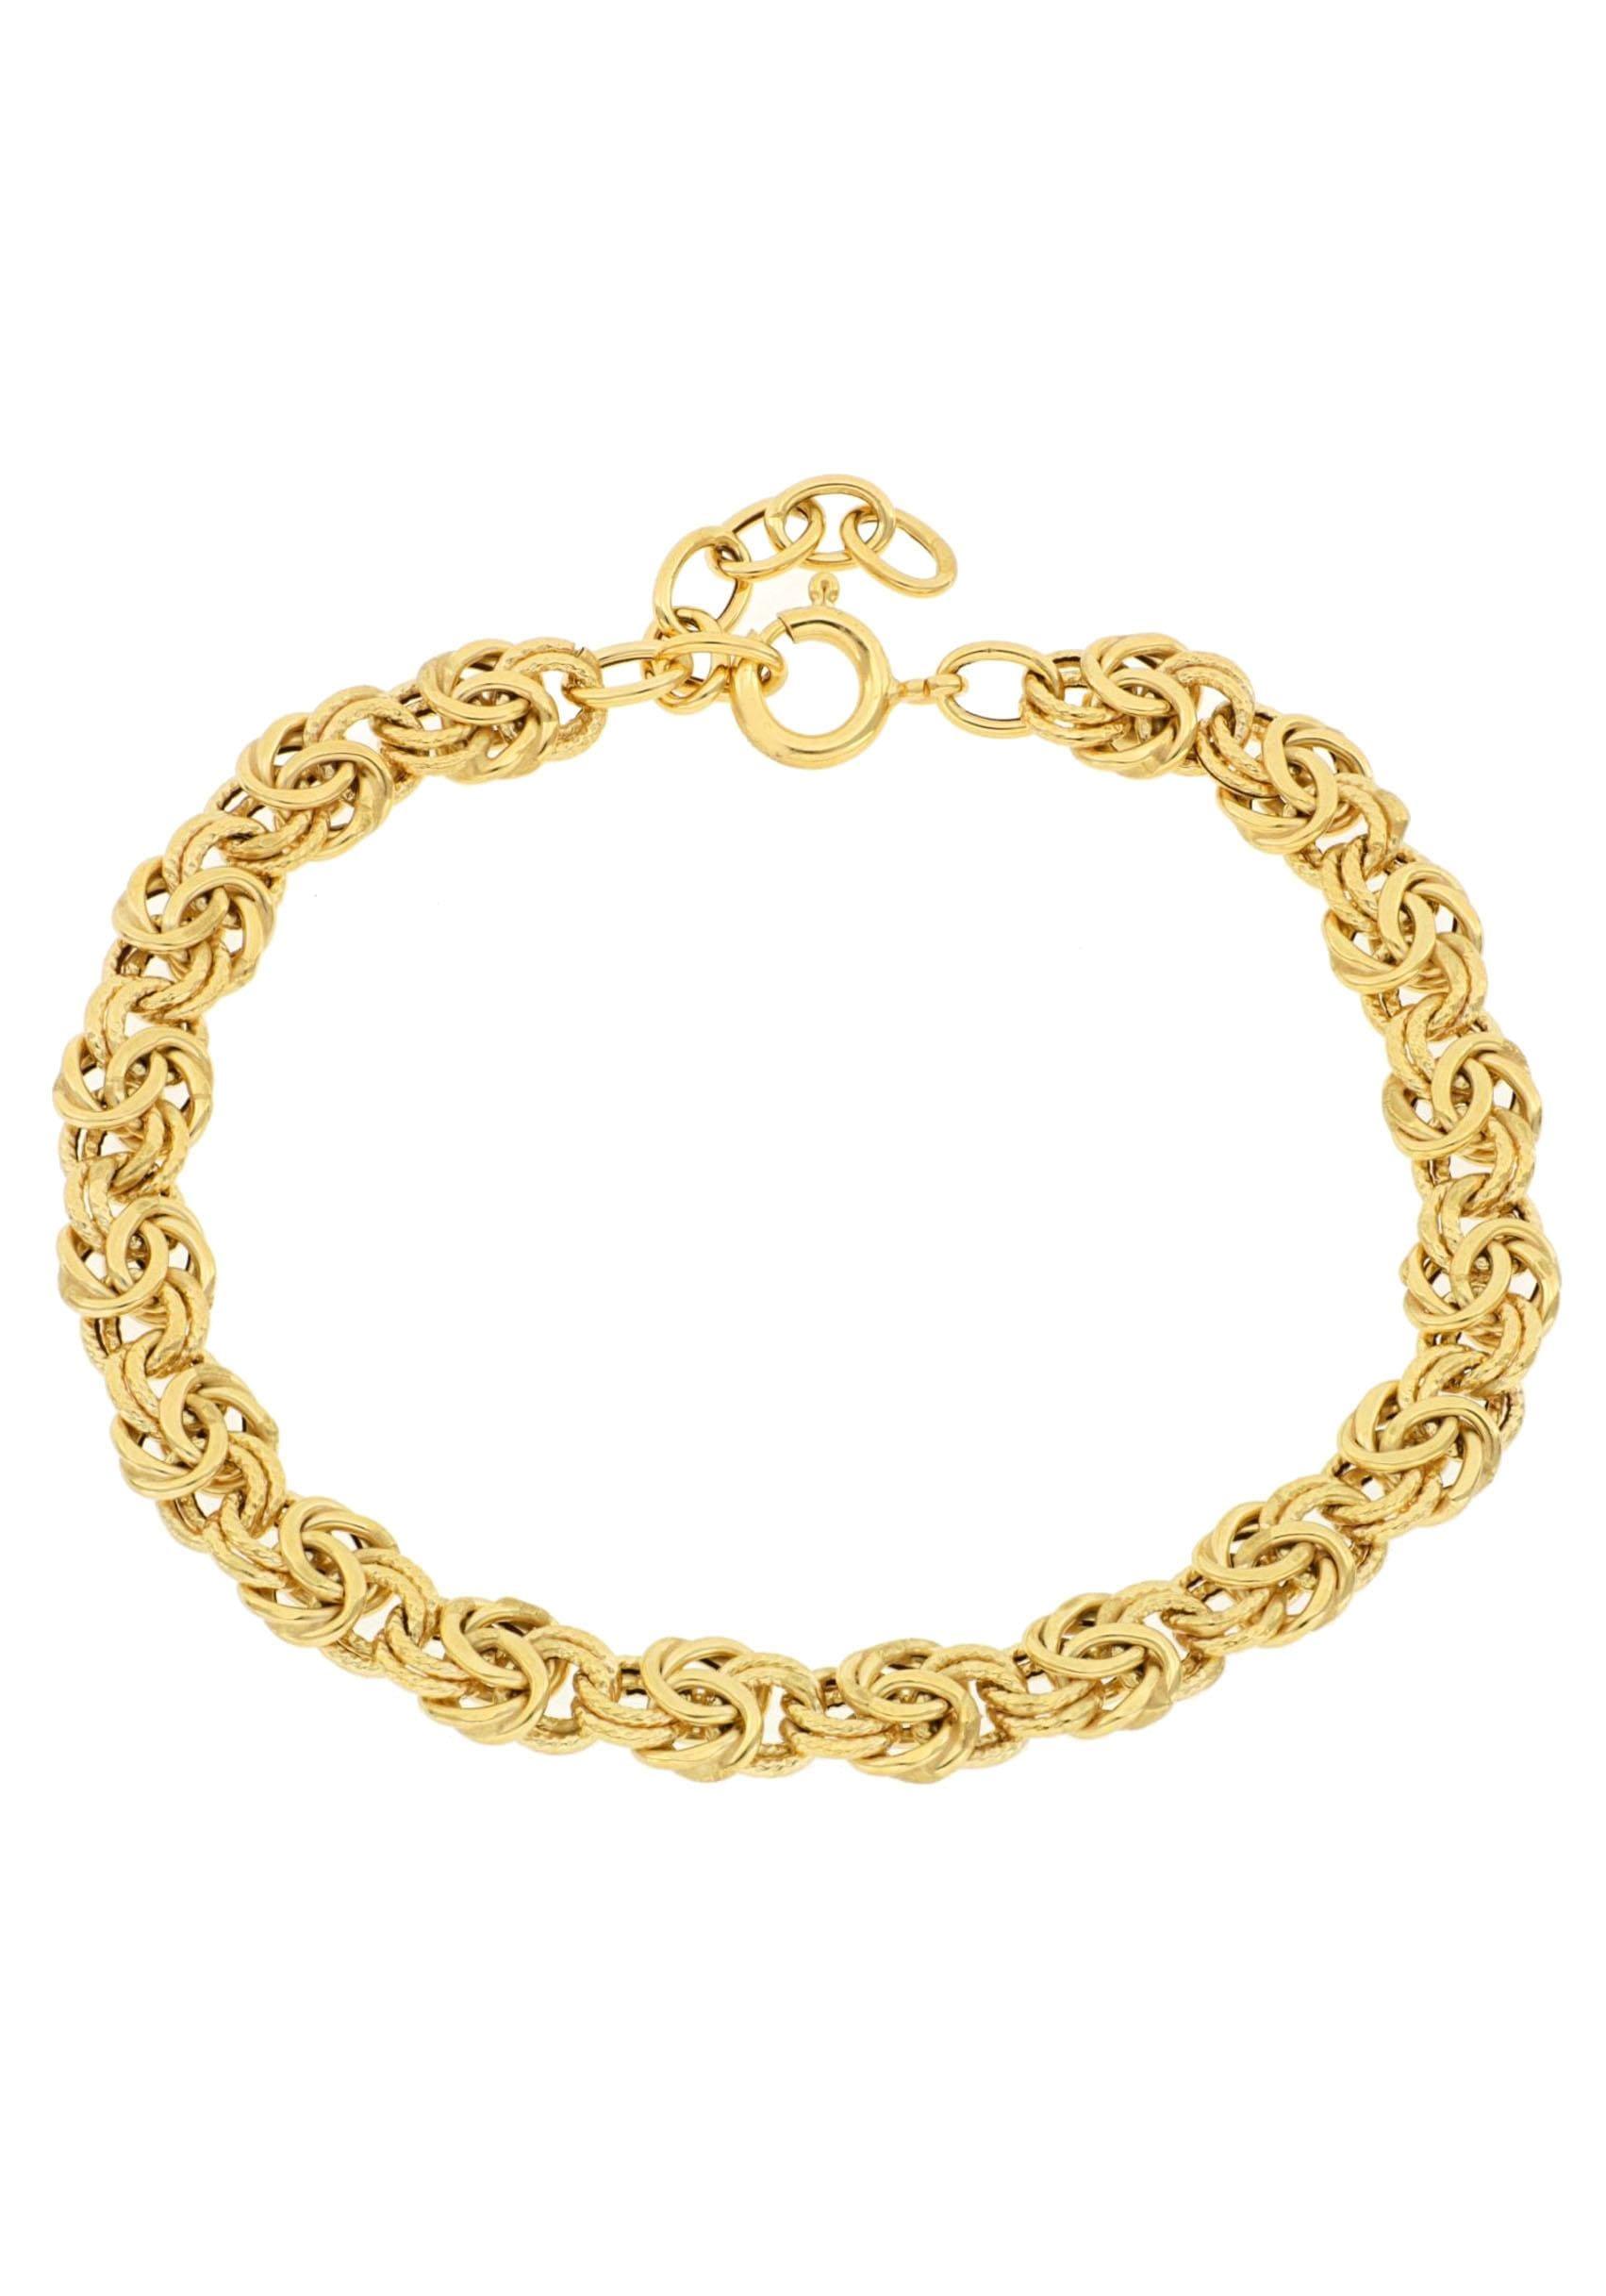 Firetti Königsarmband »7,4 mm breit, glanz, ziseliert« | Schmuck > Armbänder > Königsarmbänder | Firetti